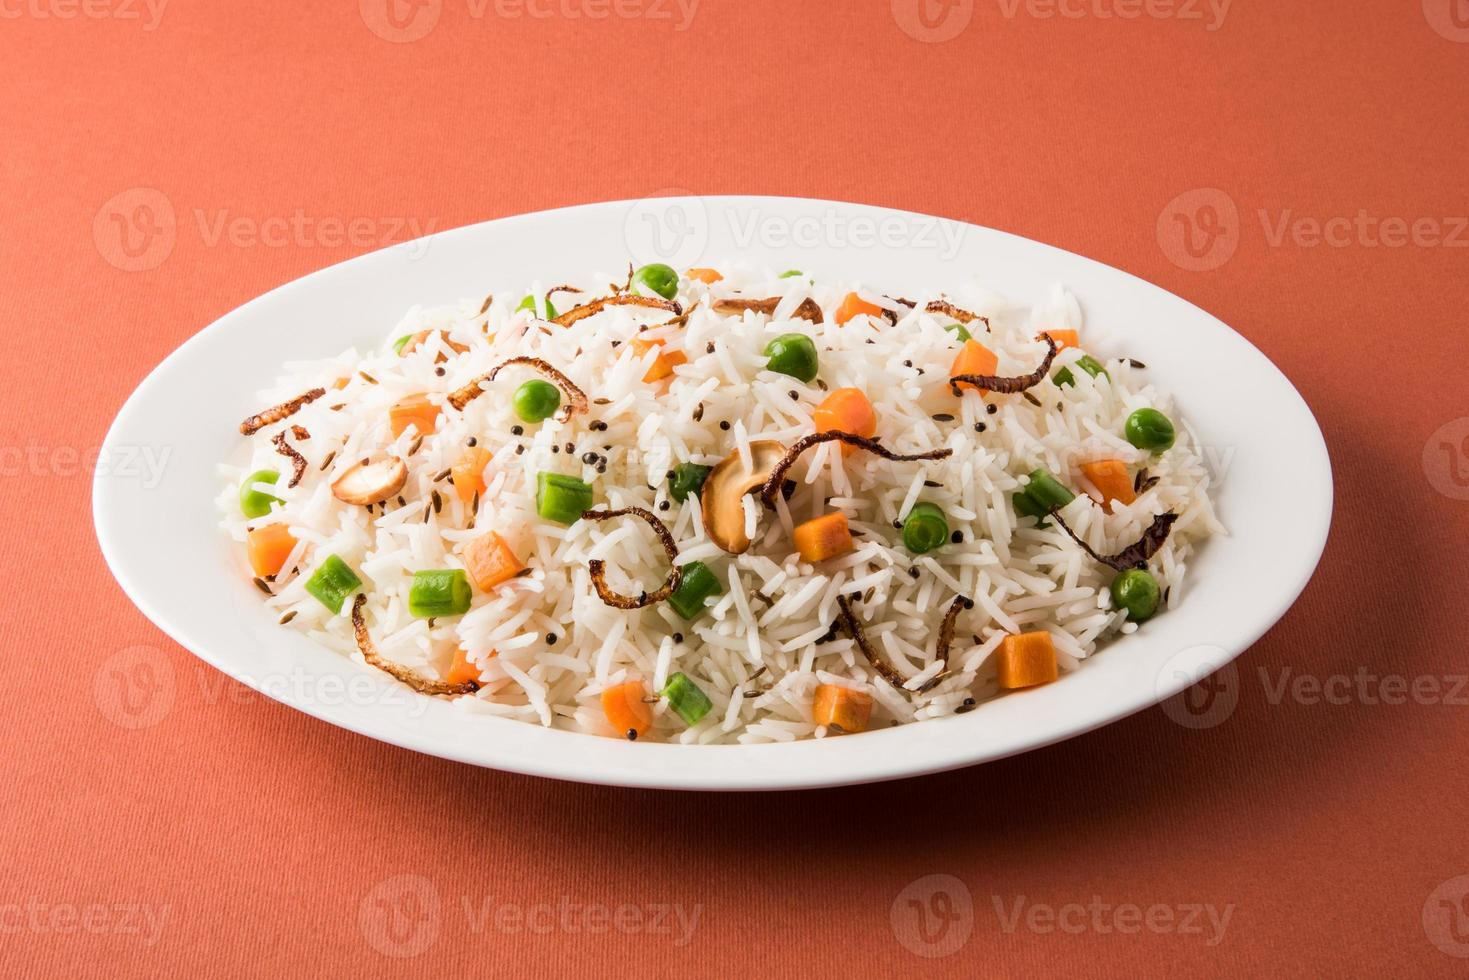 Indiase pulav of groenten rijst of groenten biryani oranje achtergrond foto